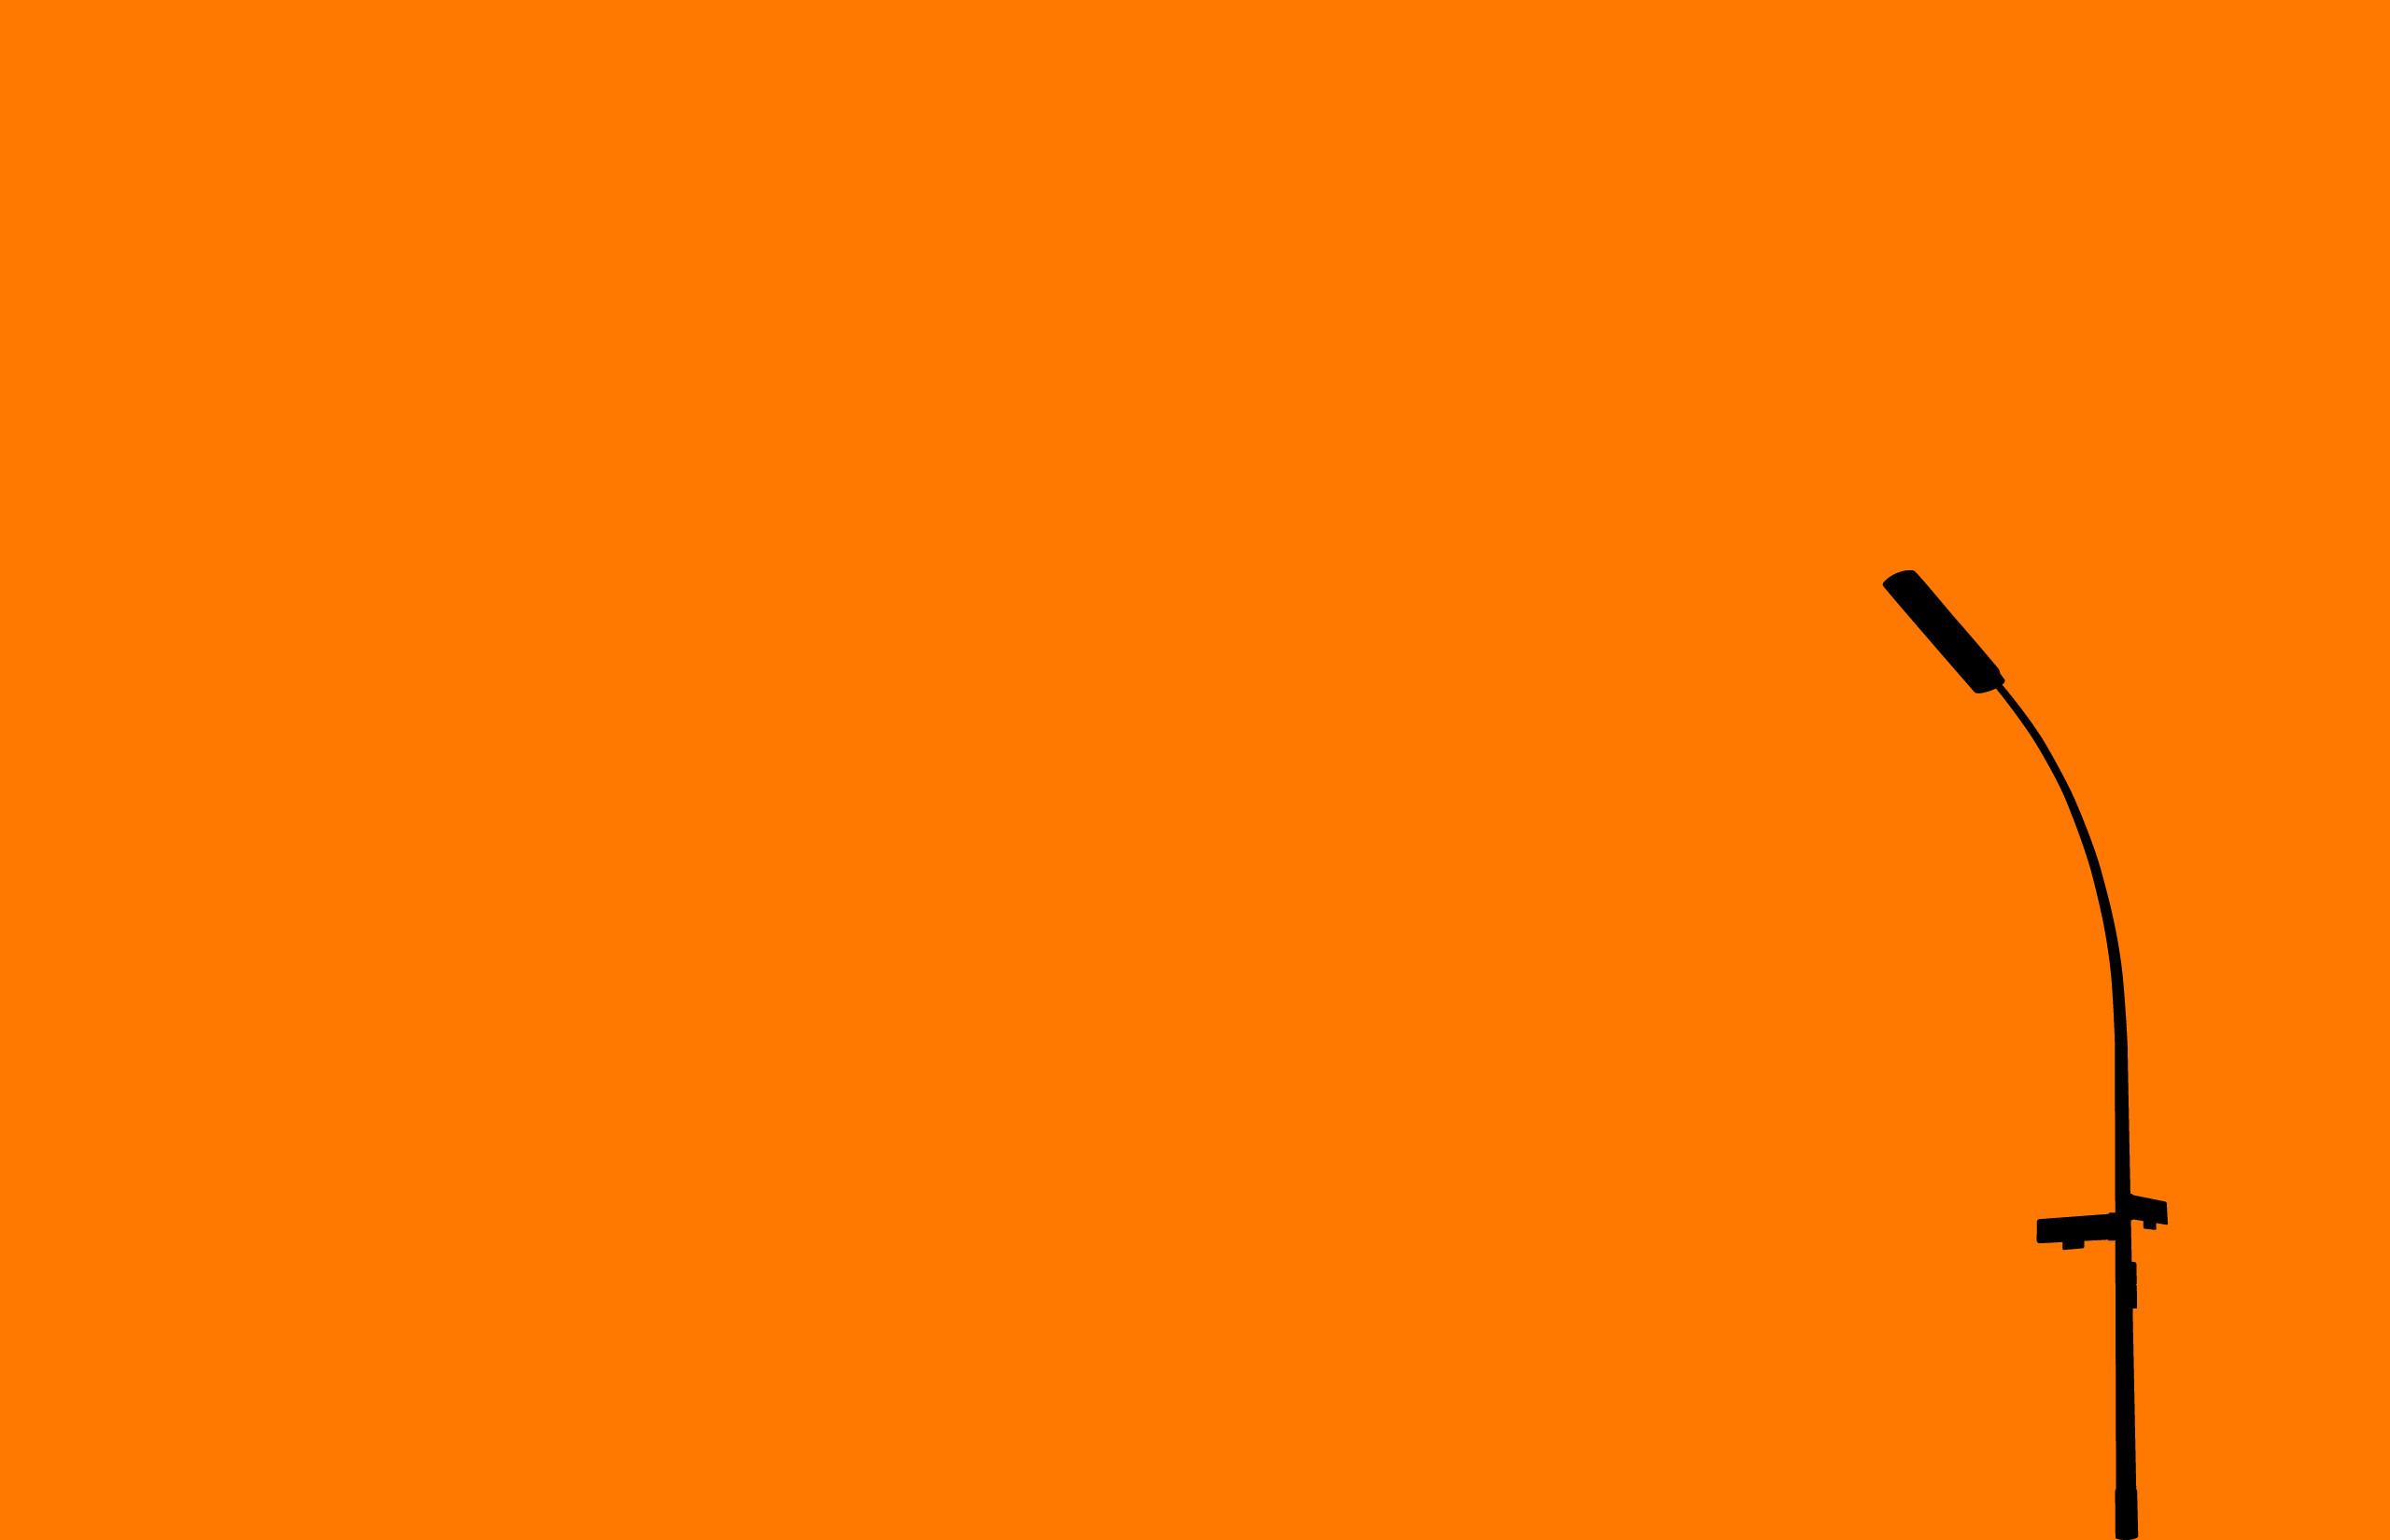 Orange Wallpaper Background